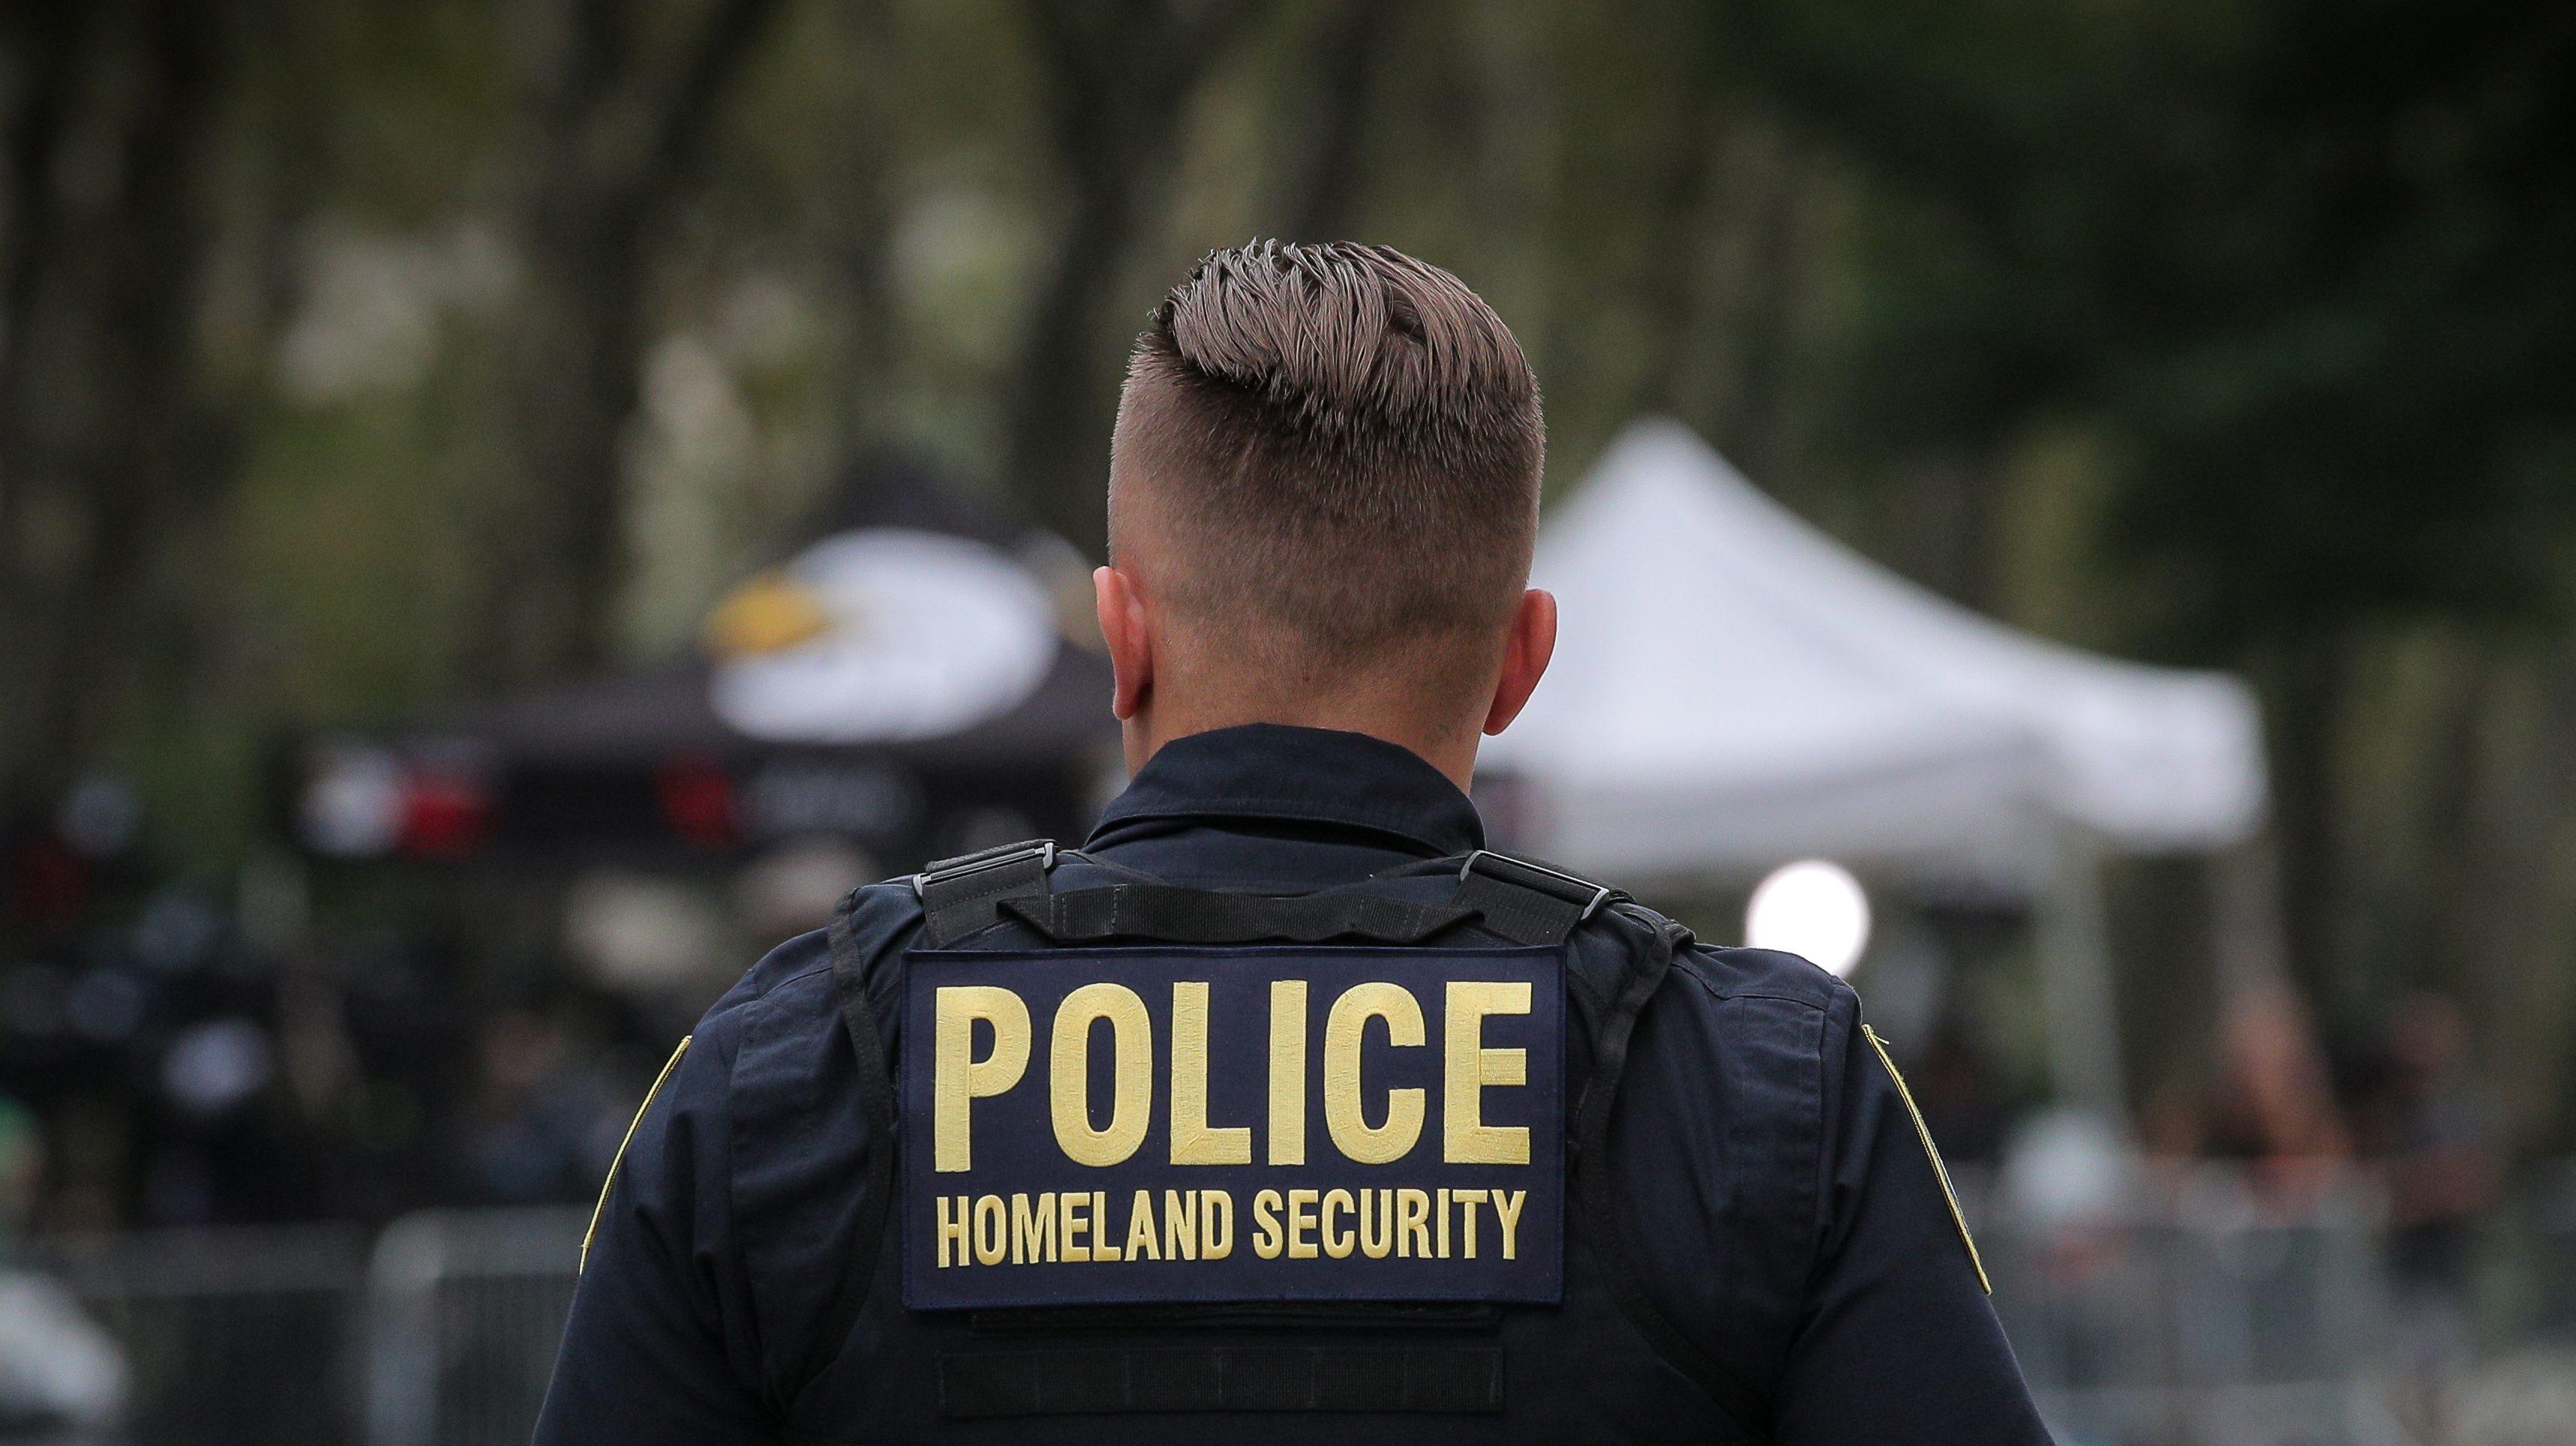 DHS has biometric data on 260 million people